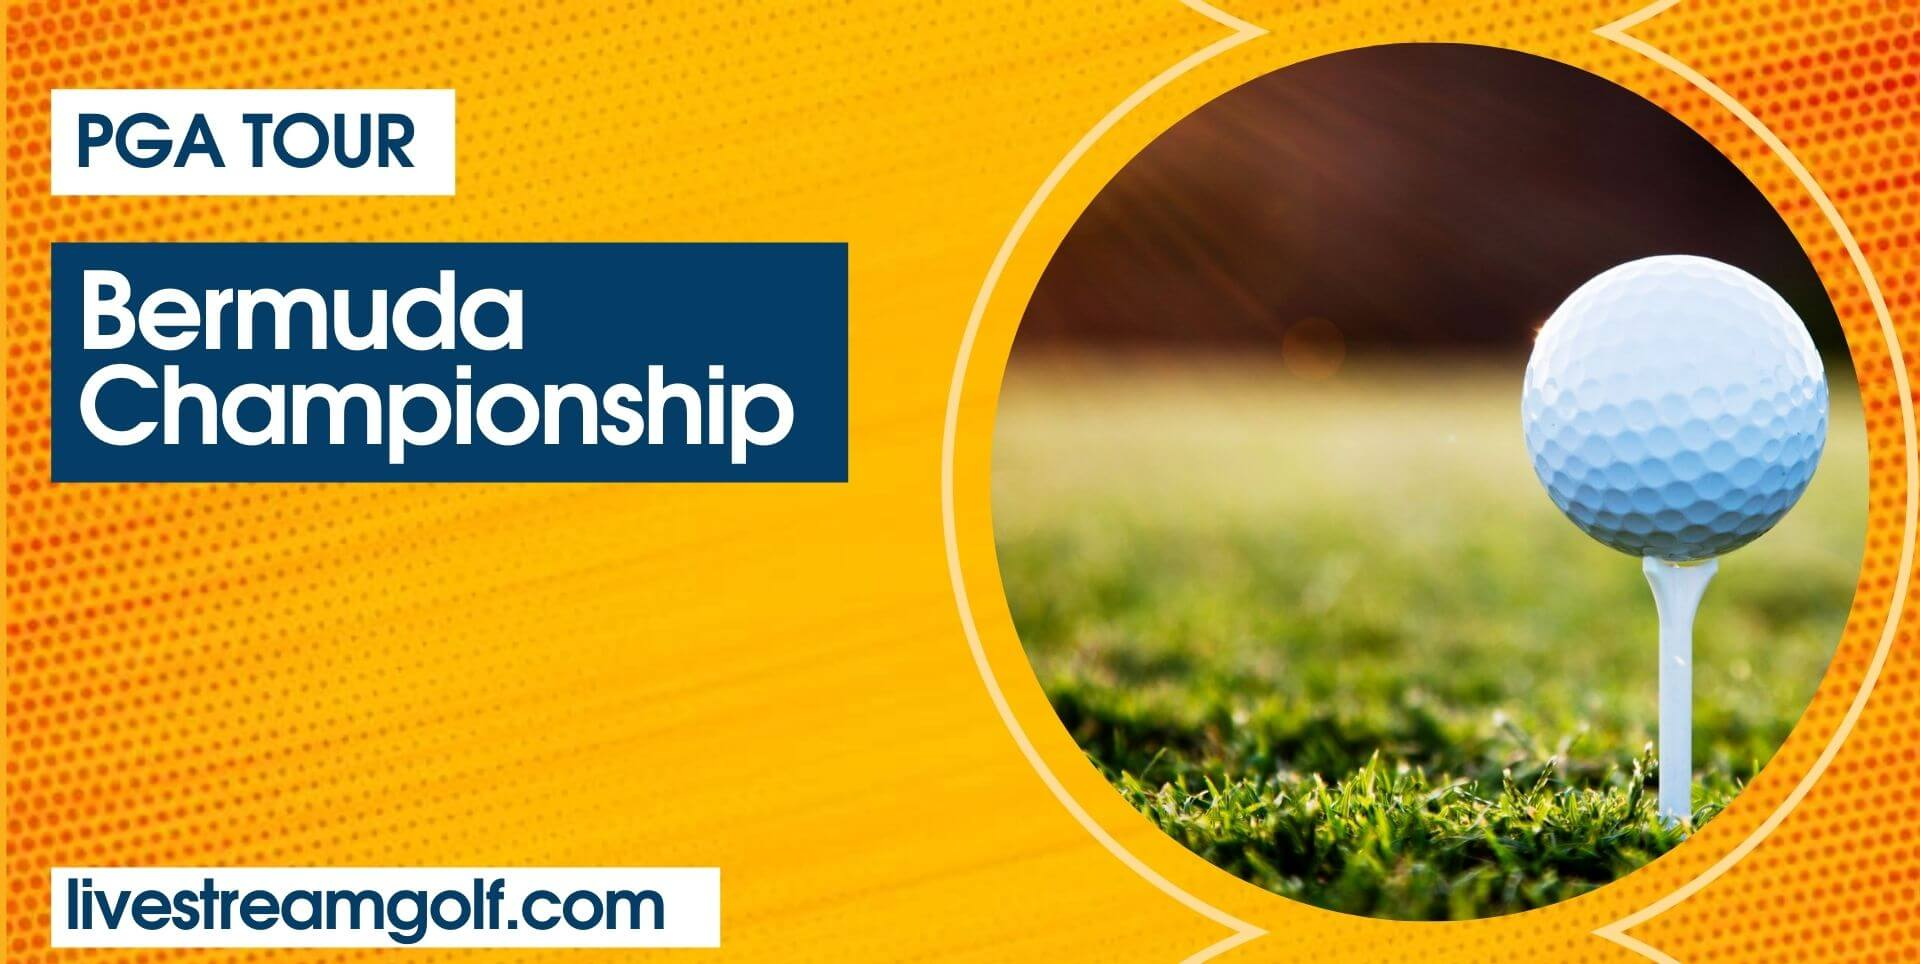 Bermuda Championship Rd 4 Live Stream: PGA Tour 2021